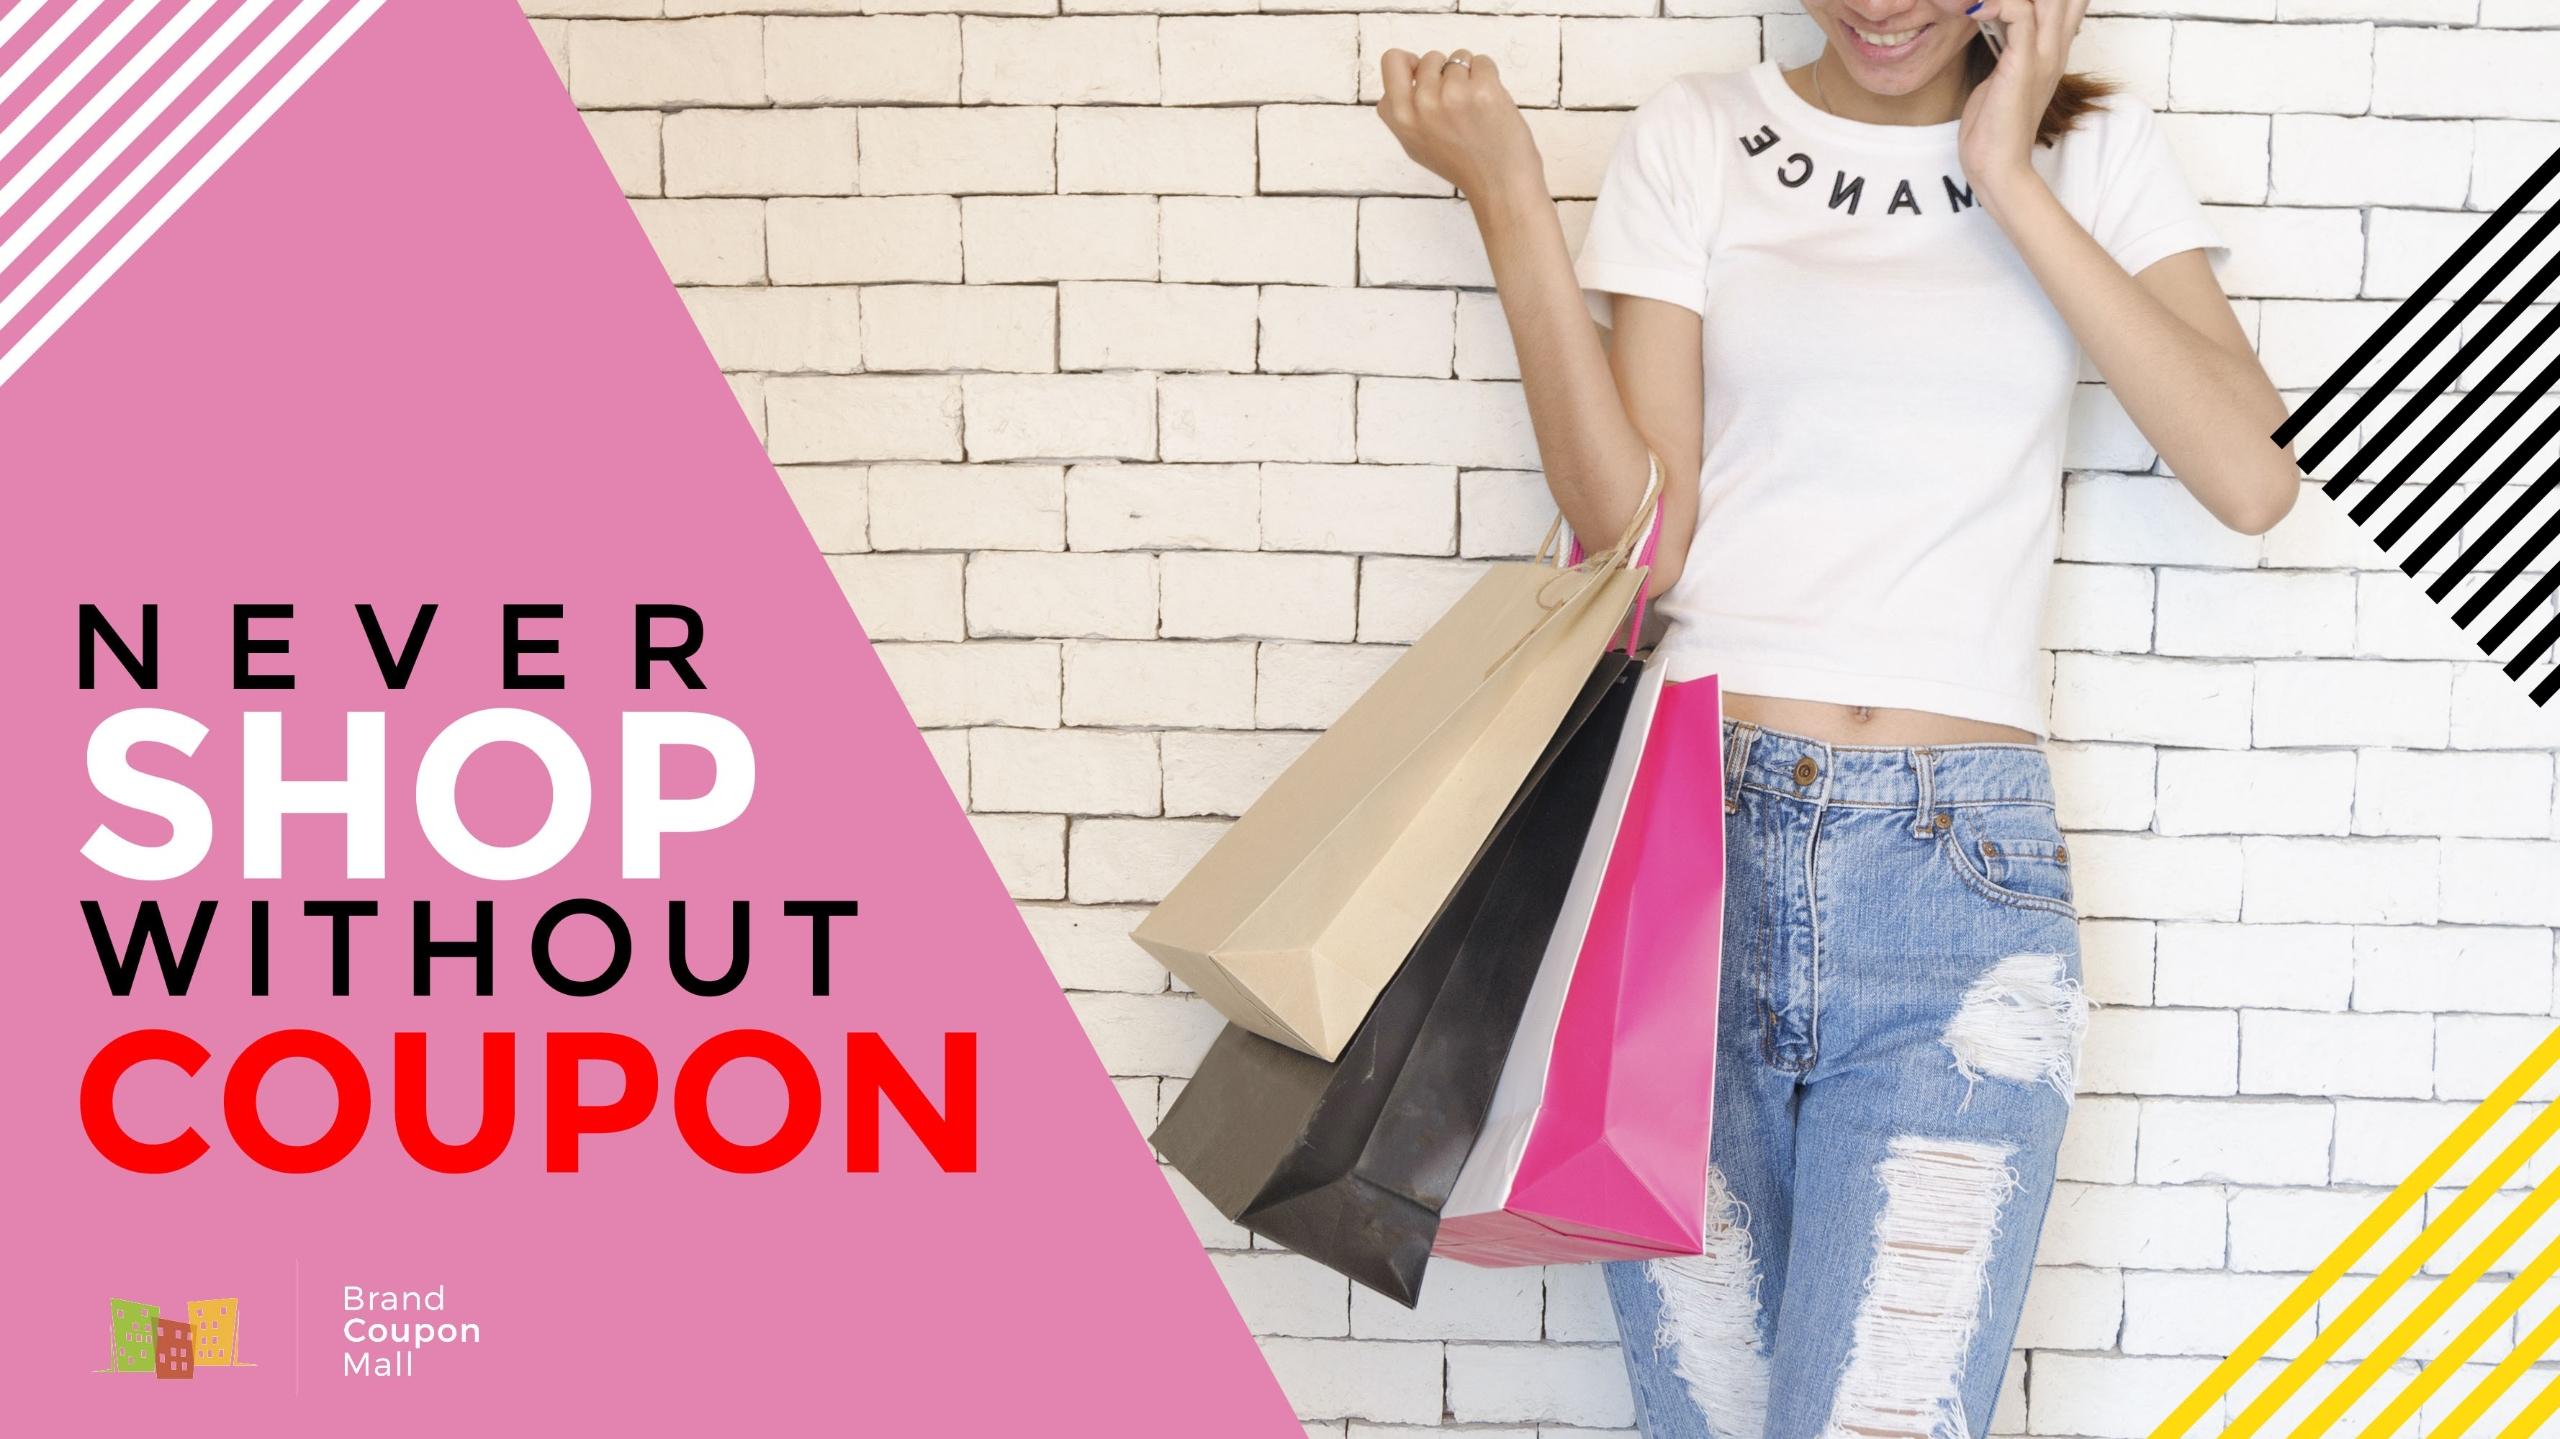 couponbrandmall (@couponbrandmall) Cover Image